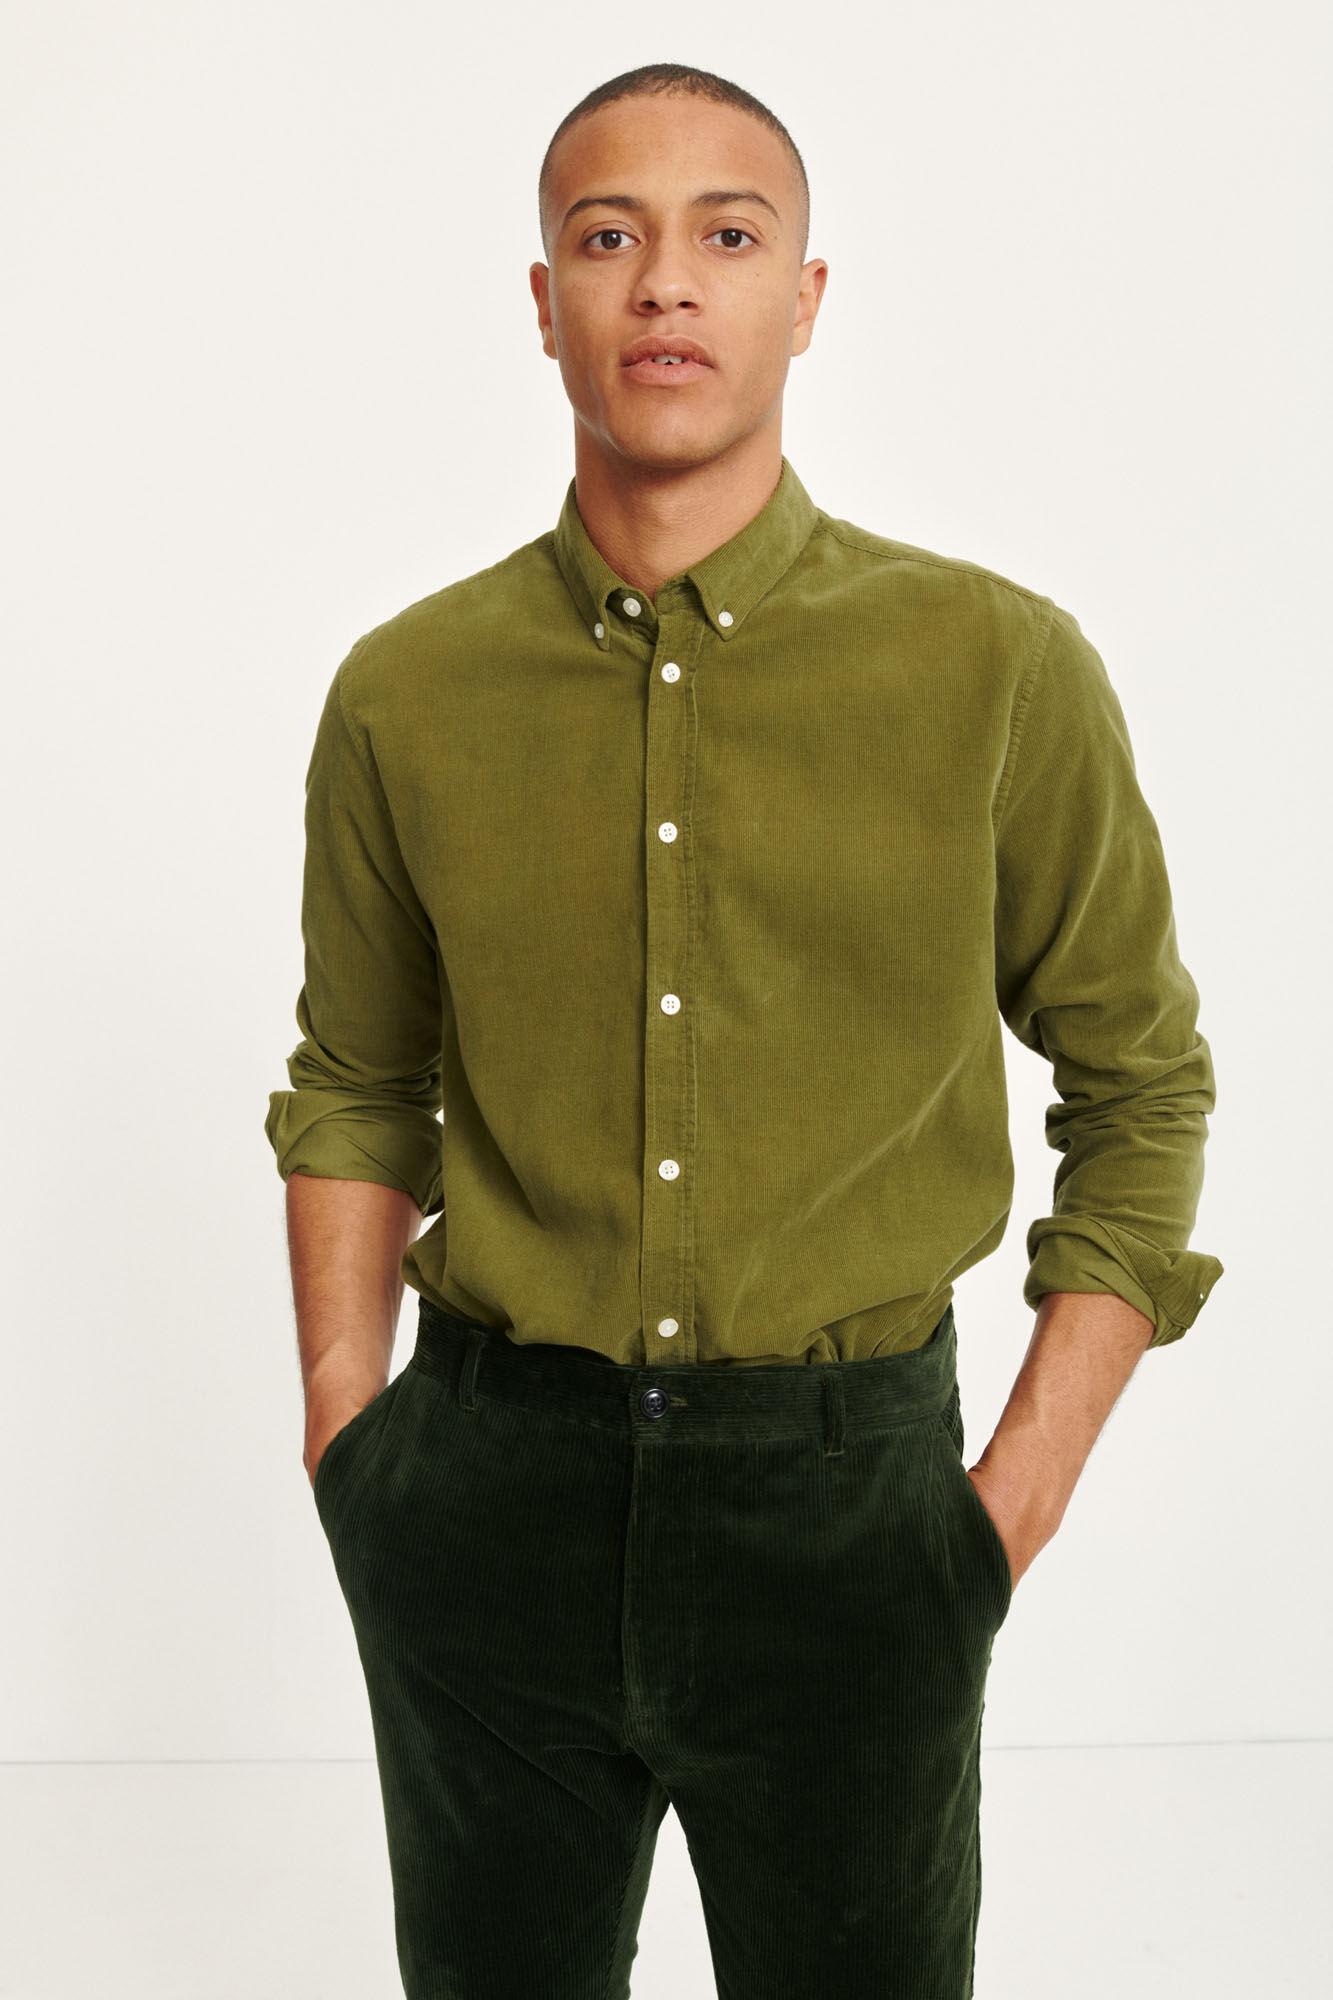 Liam BX Shirt Capulet Olive Green Corduroy-4